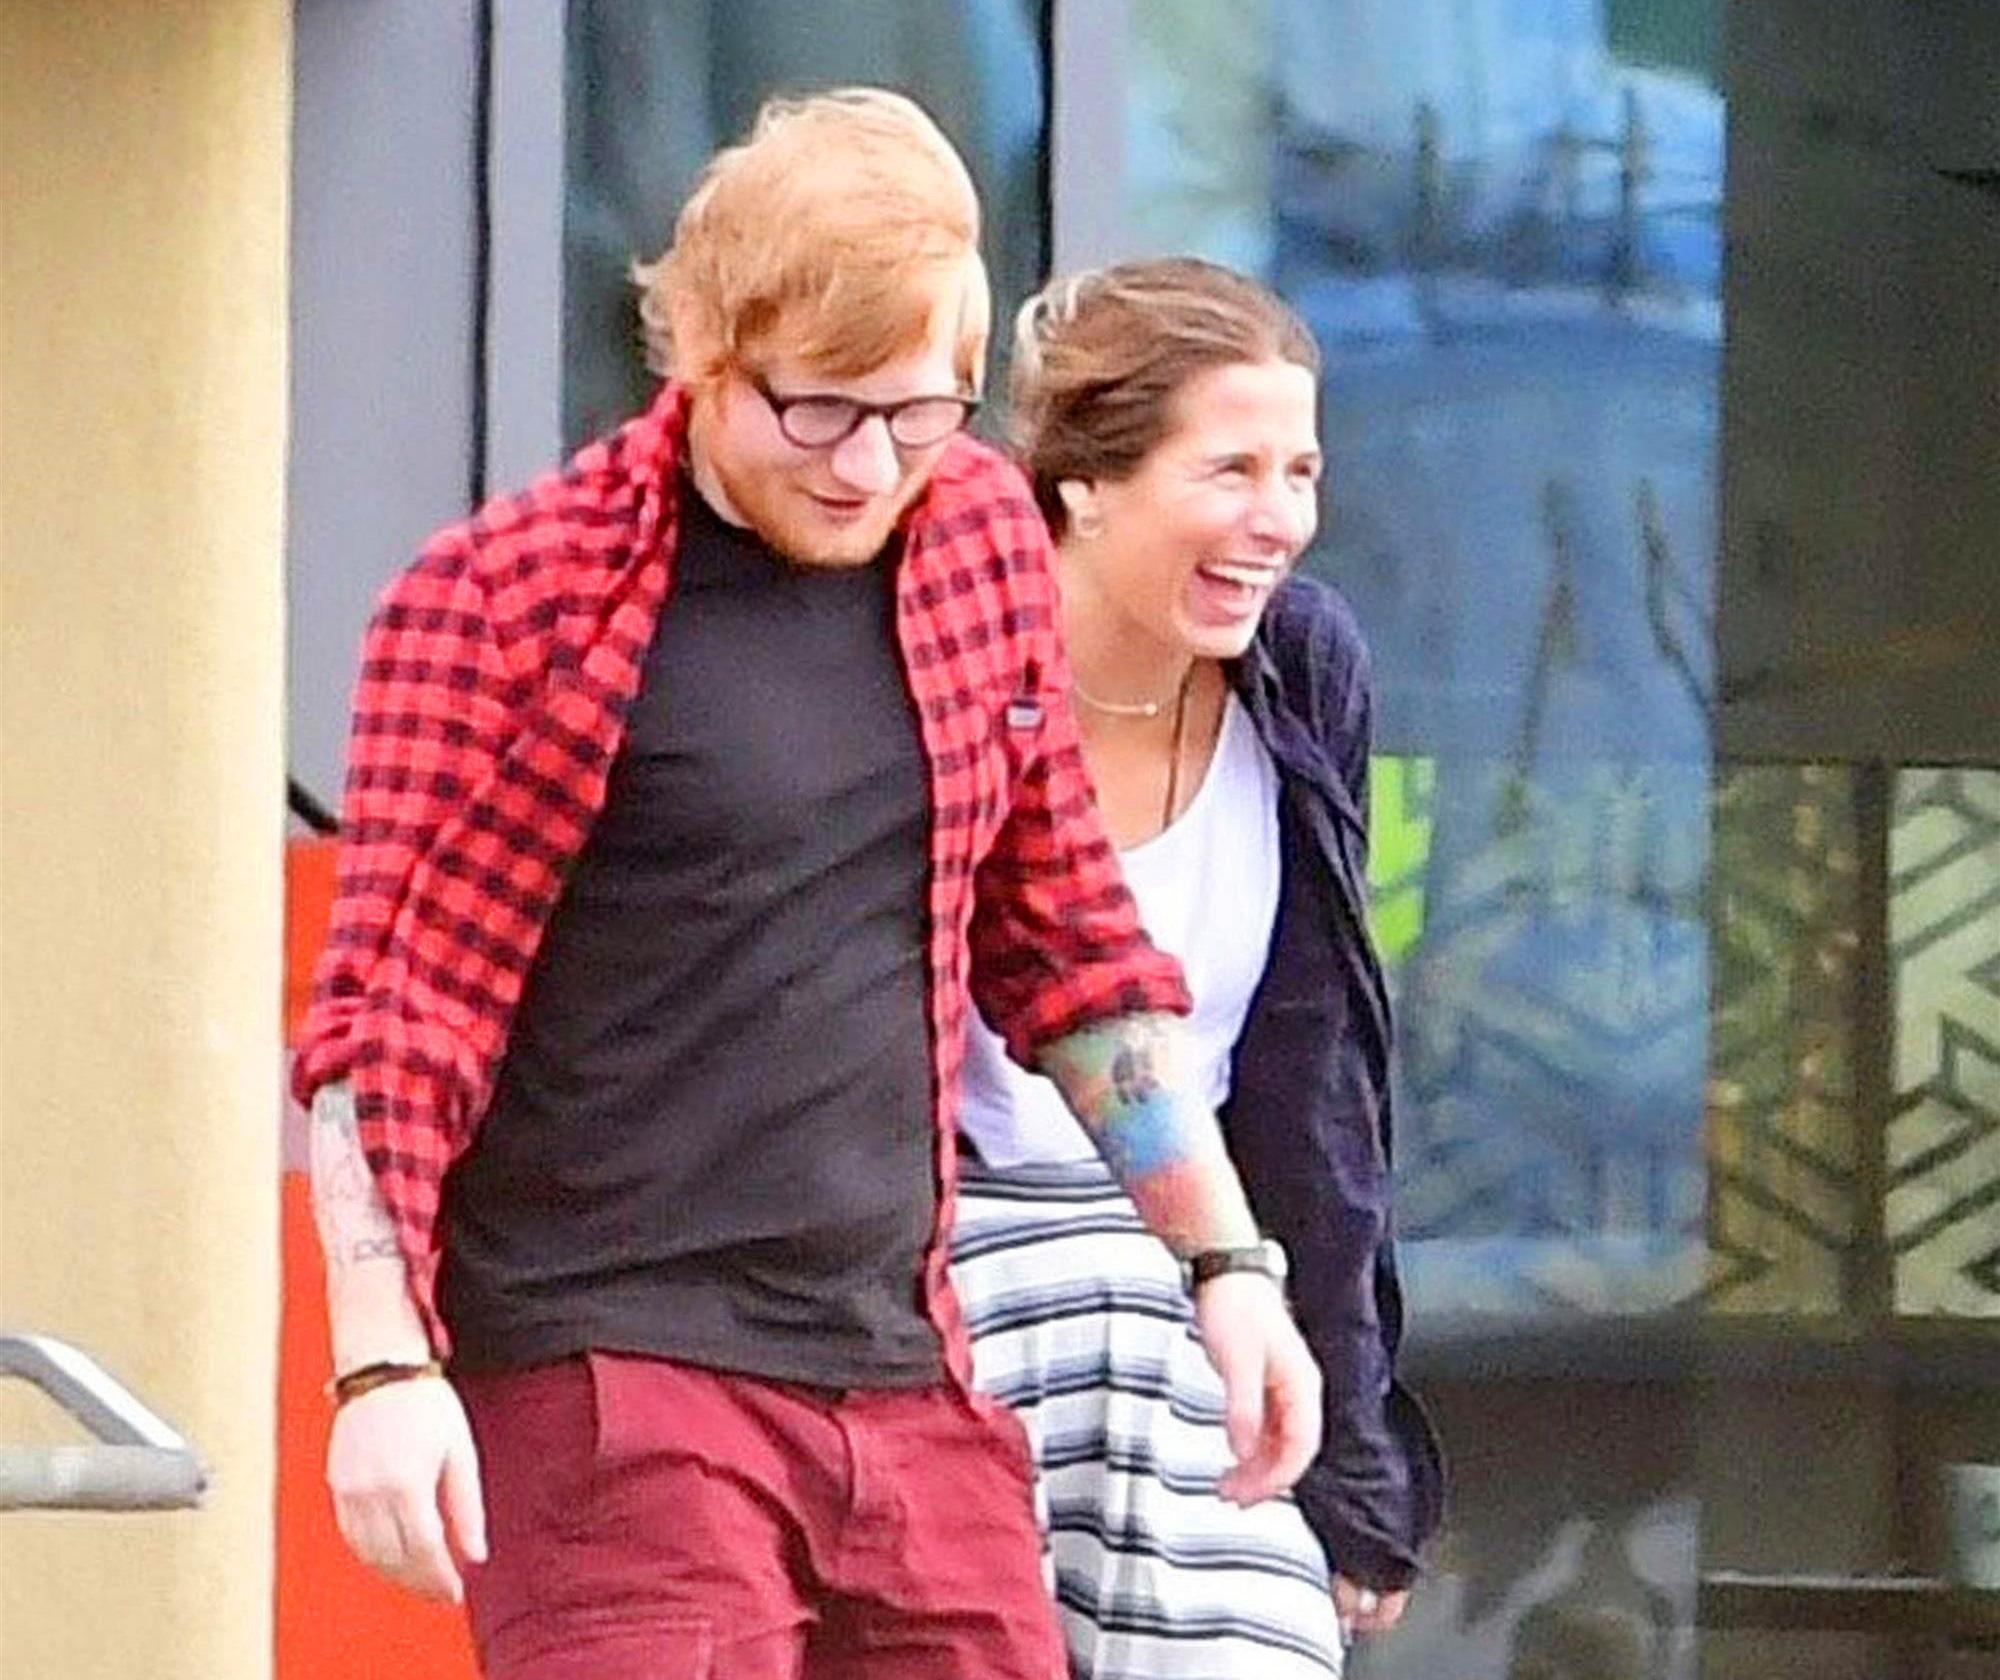 Did Ed Sheeran Already Marry Fiancee Cherry Seaborn